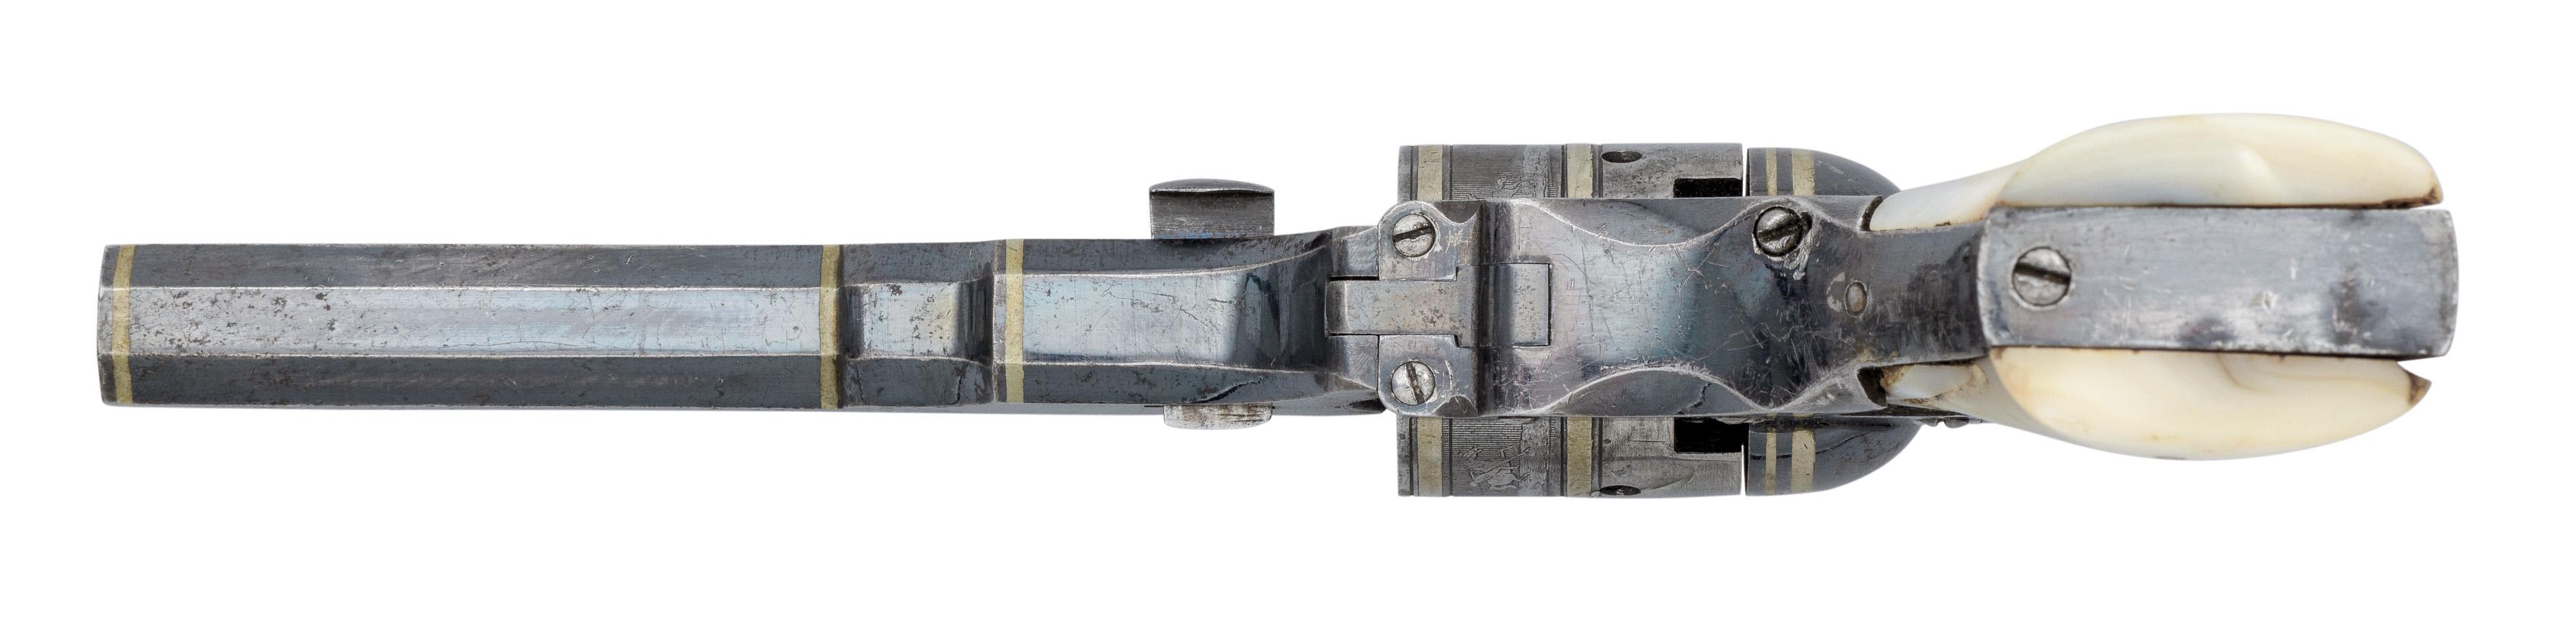 Ⓦ AN EXTREMELY RARE .31 CALIBRE PERCUSSION COLT PATERSON NO. 2 MODEL POCKET REVOLVER^ NO. 570^ CI - Image 4 of 6